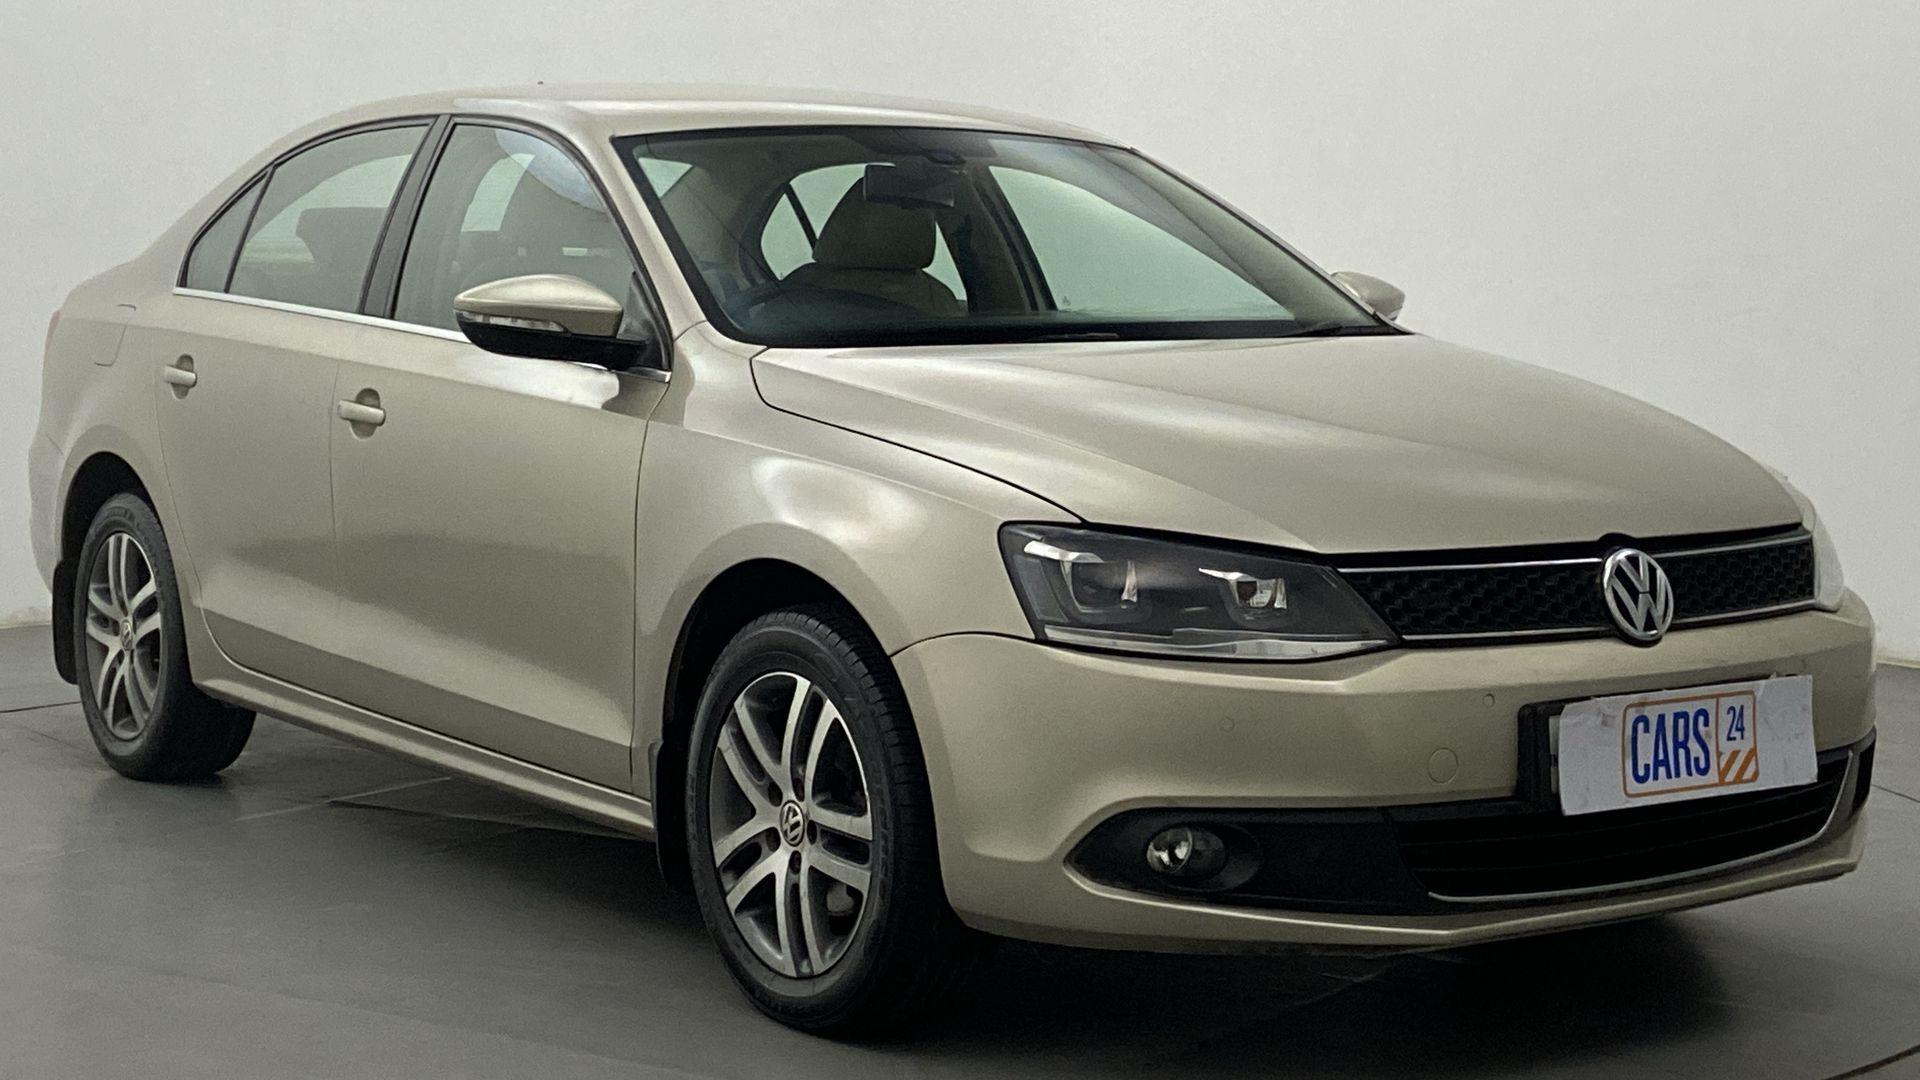 2012 Volkswagen Jetta HIGHLINE TDI AT